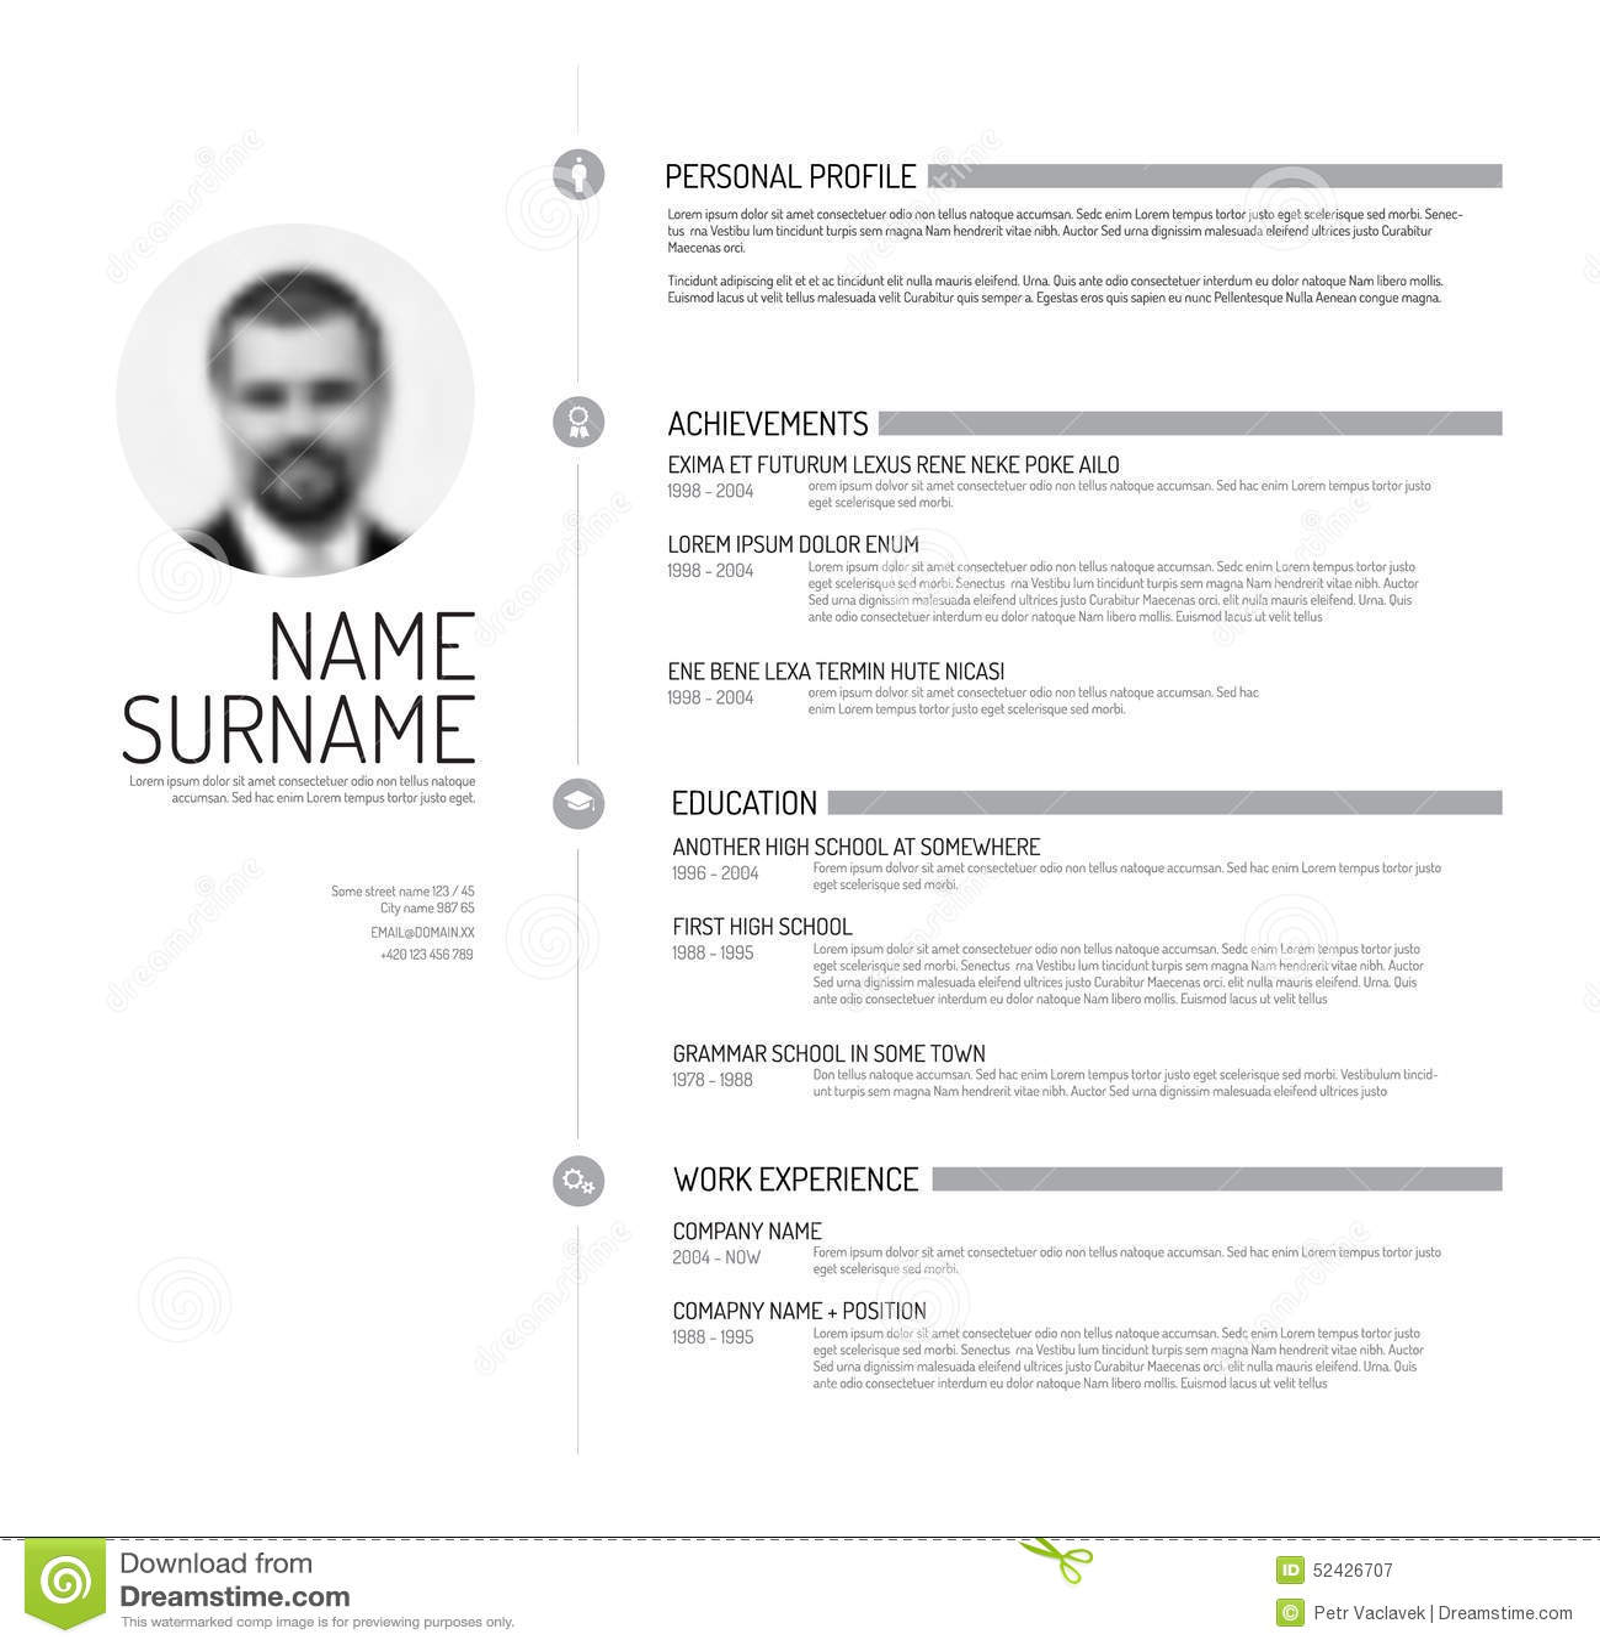 Curriculum vitae formato word en blanco - custom dissertation help